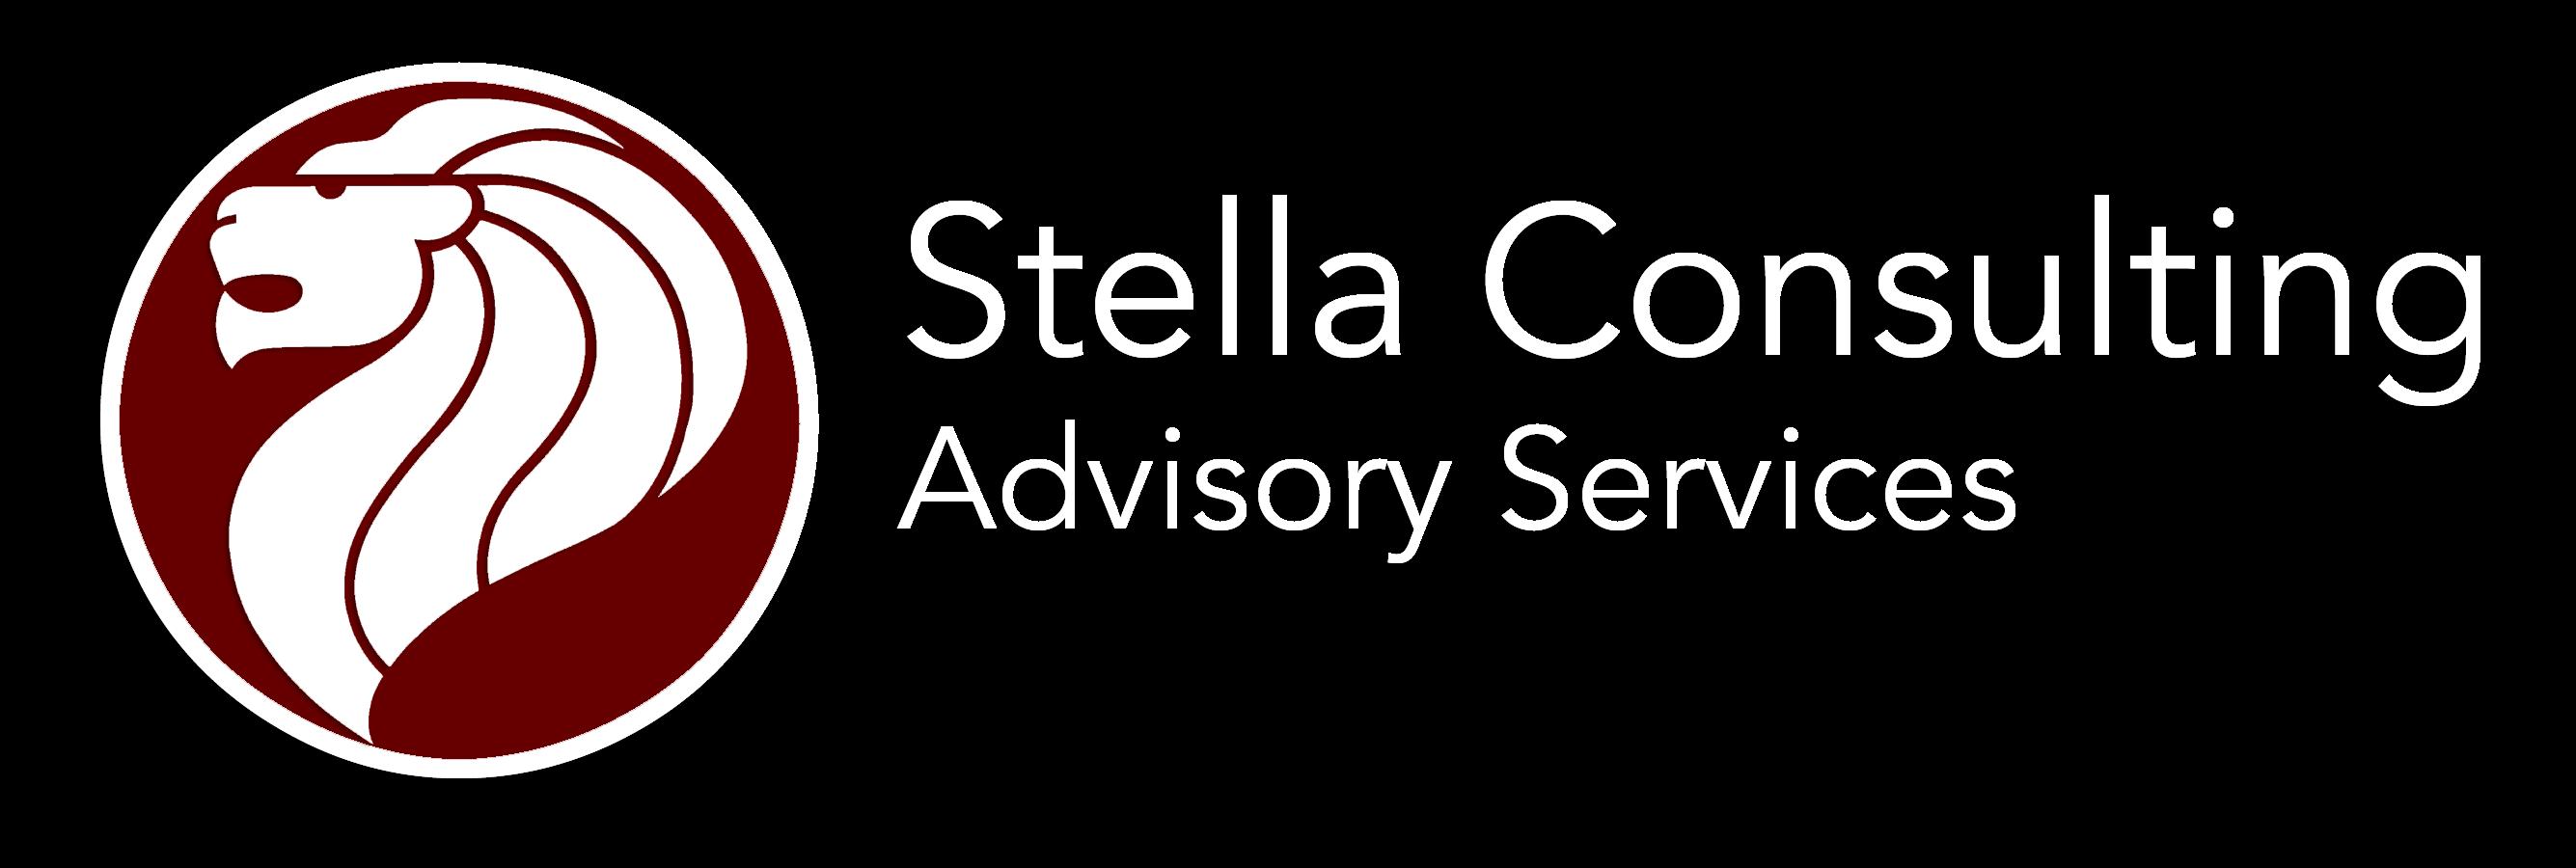 Stella Consulting